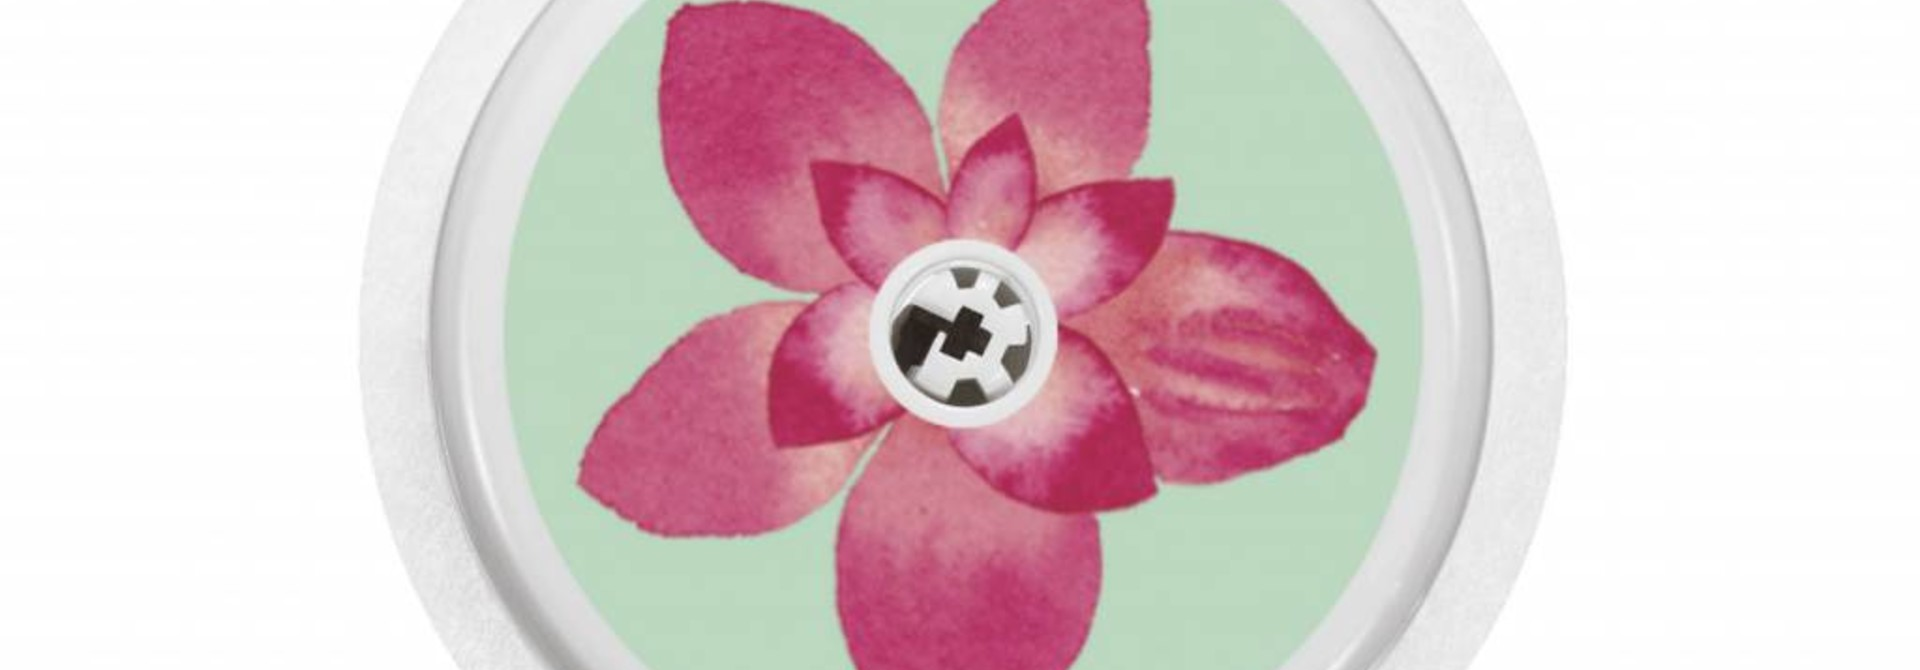 FLOWER Sensor Sticker - FreeStyle Libre